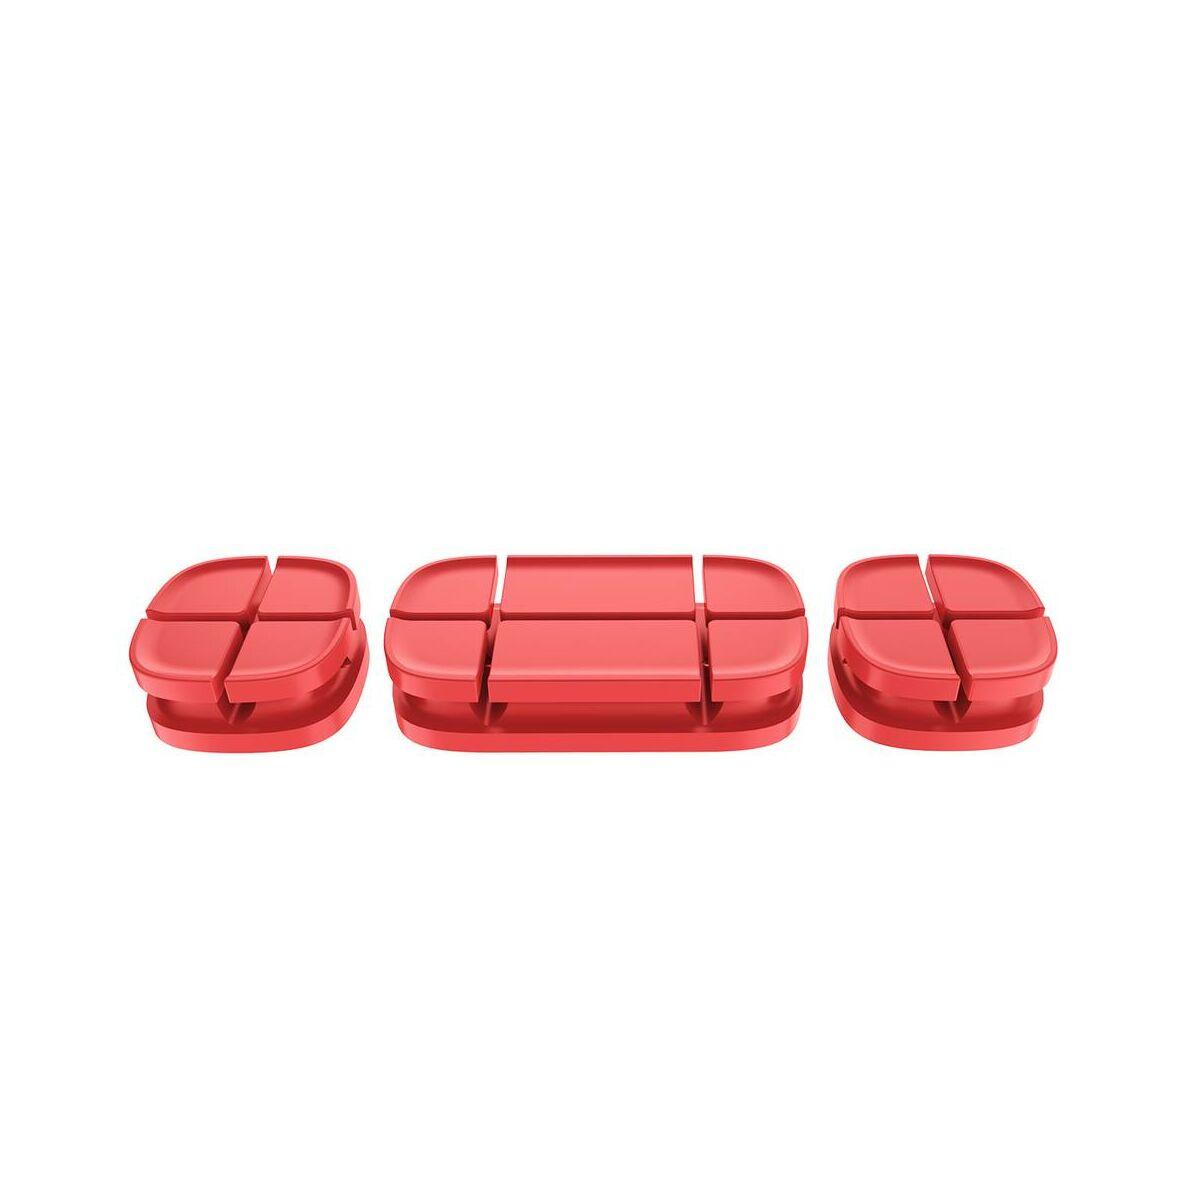 Baseus Cross Peas kábelrendező, piros (ACTDJ-09)